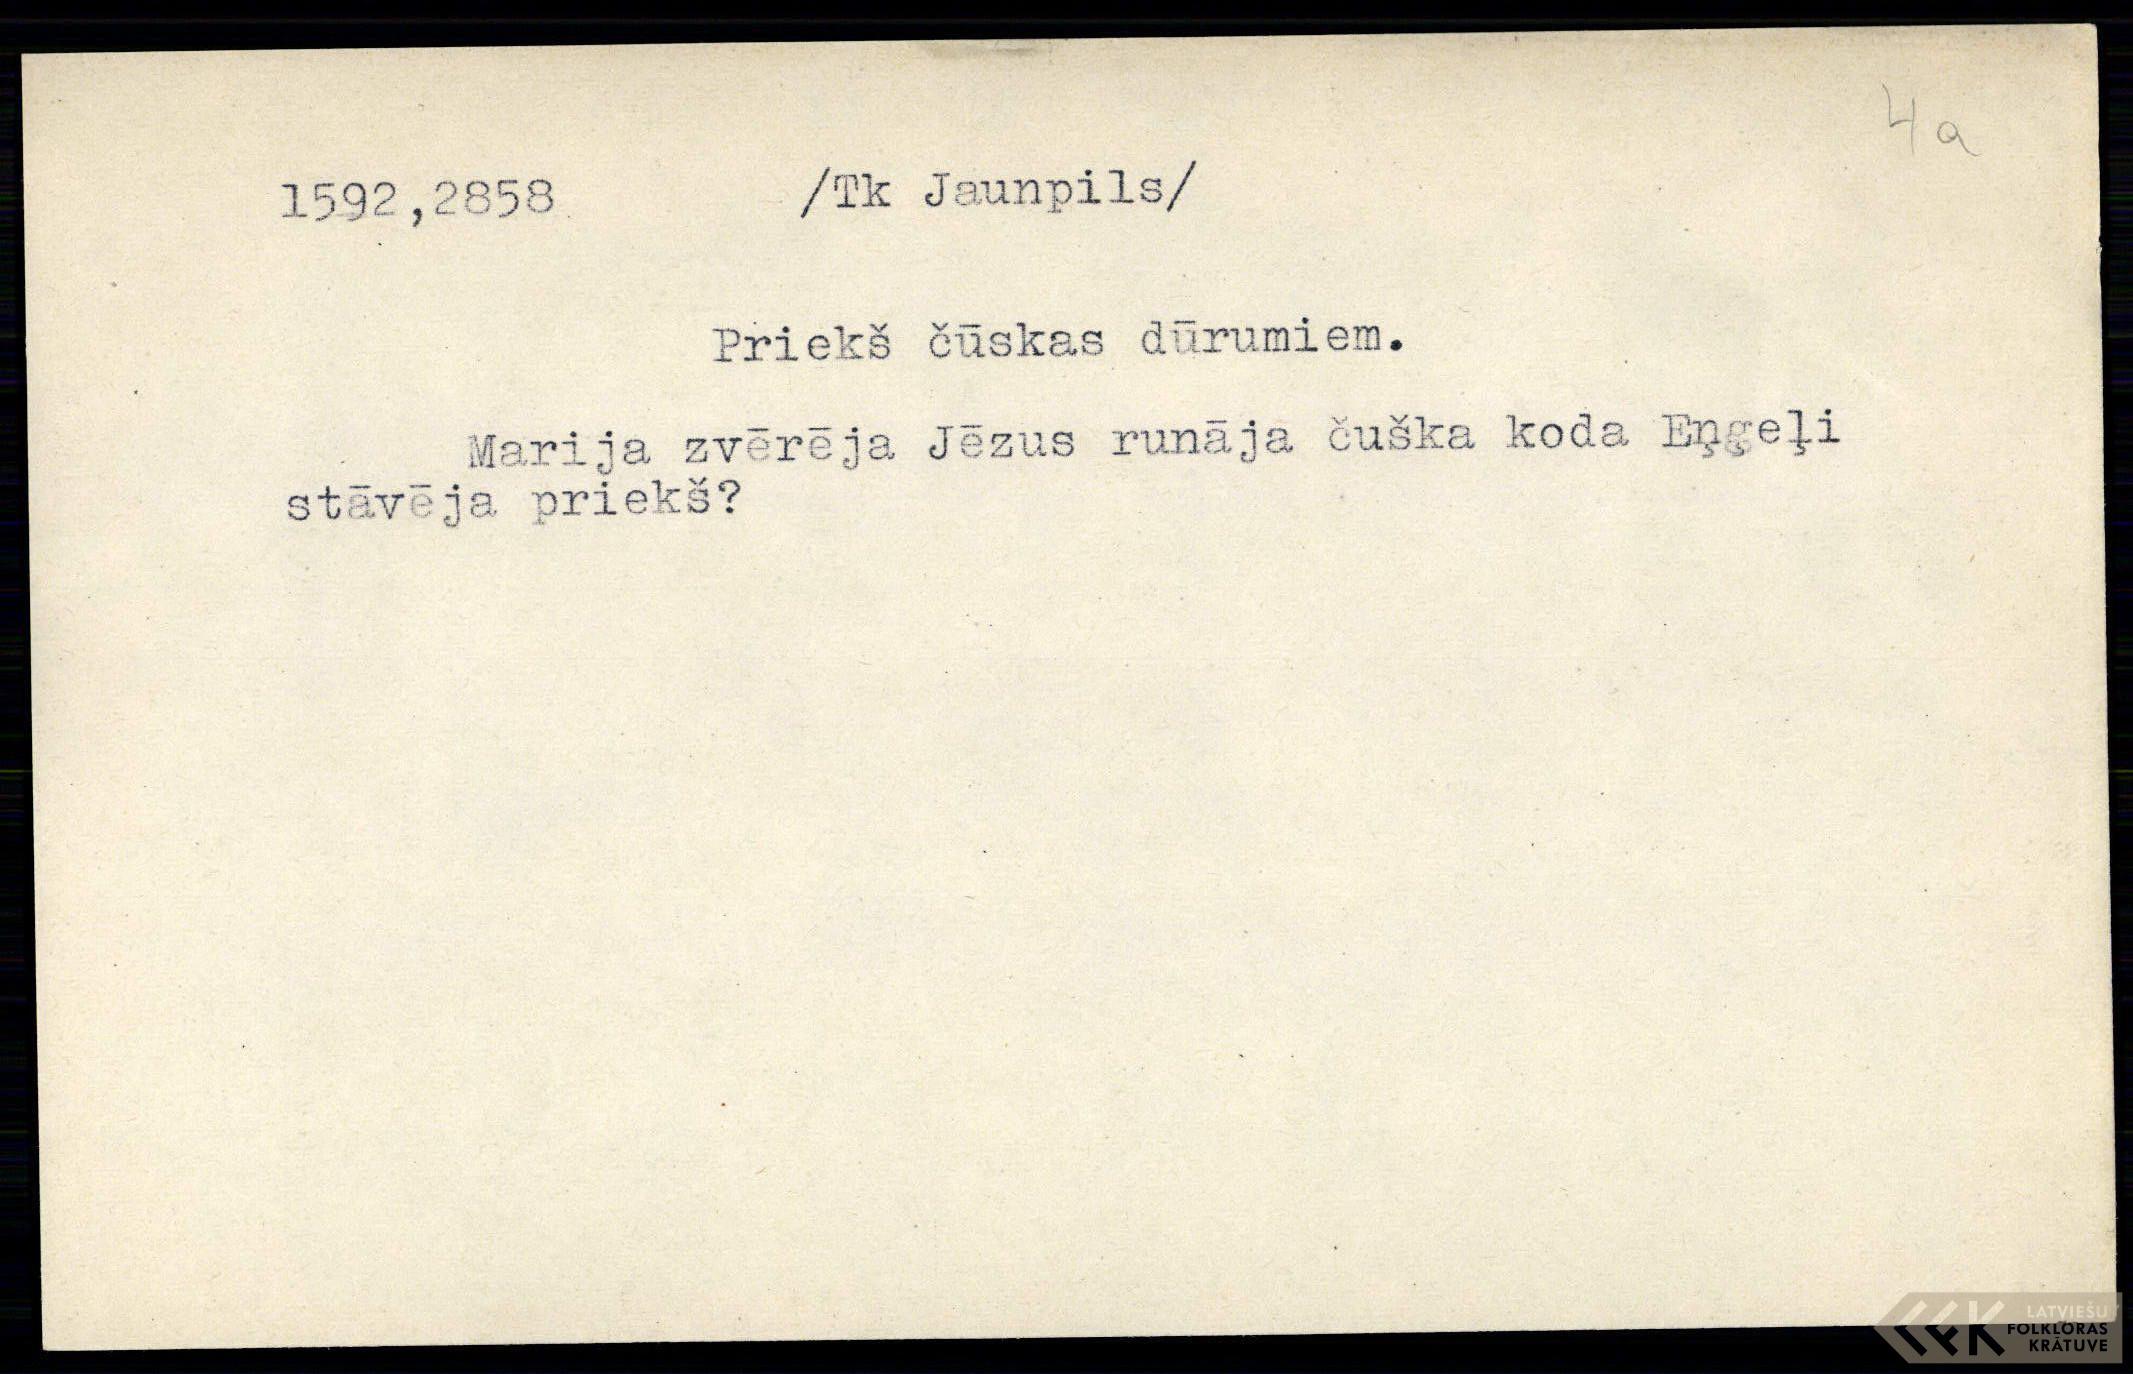 LFK-1592-02858-buramvardu-kartoteka